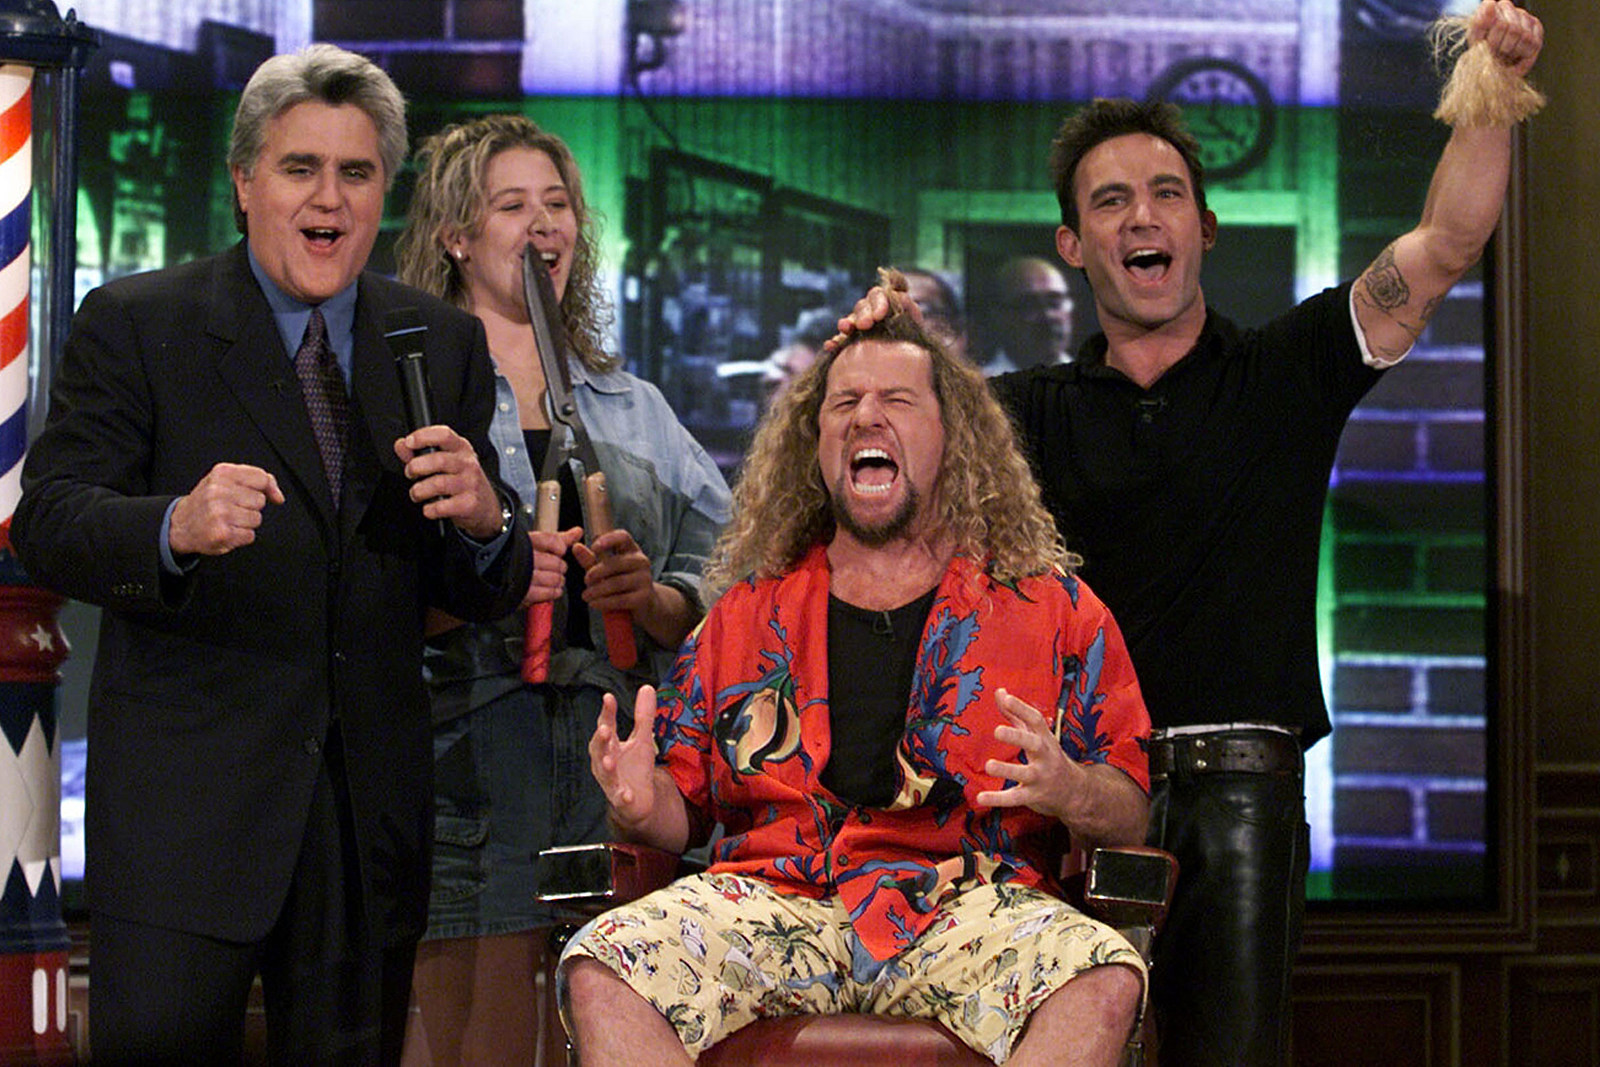 20 Years Ago: Sammy Hagar Cuts His Hair on 'The Tonight Show'